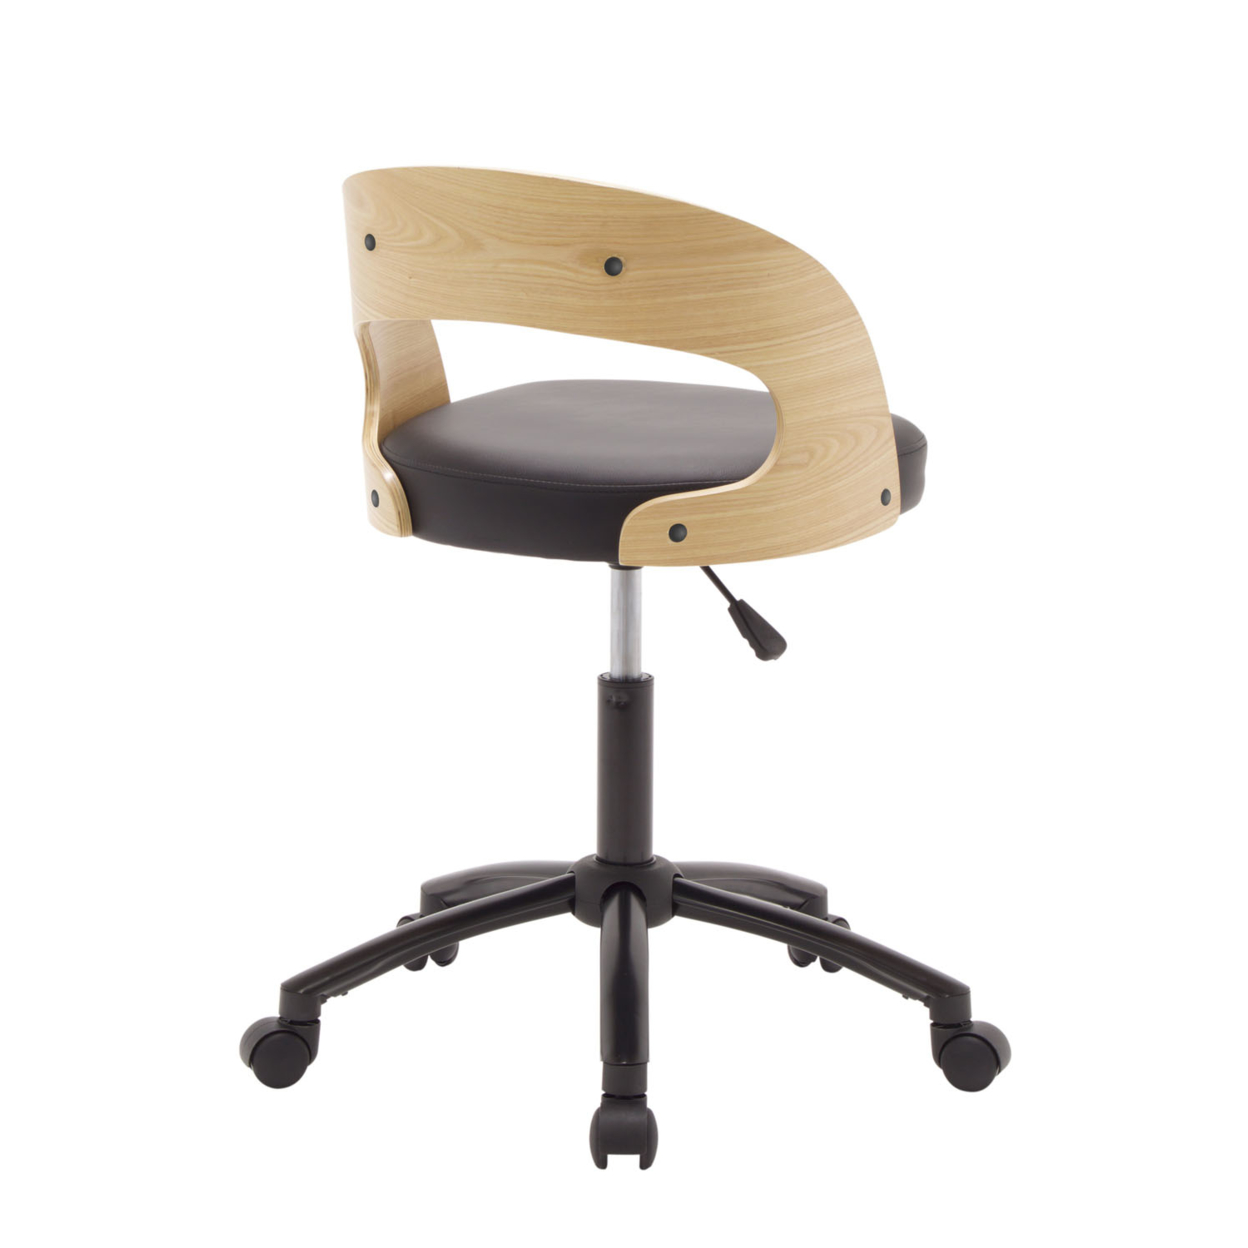 Studio Designs Home Office Ashwood Chair - Black/Ashwood studio designs home office maxima ii drafting chair black